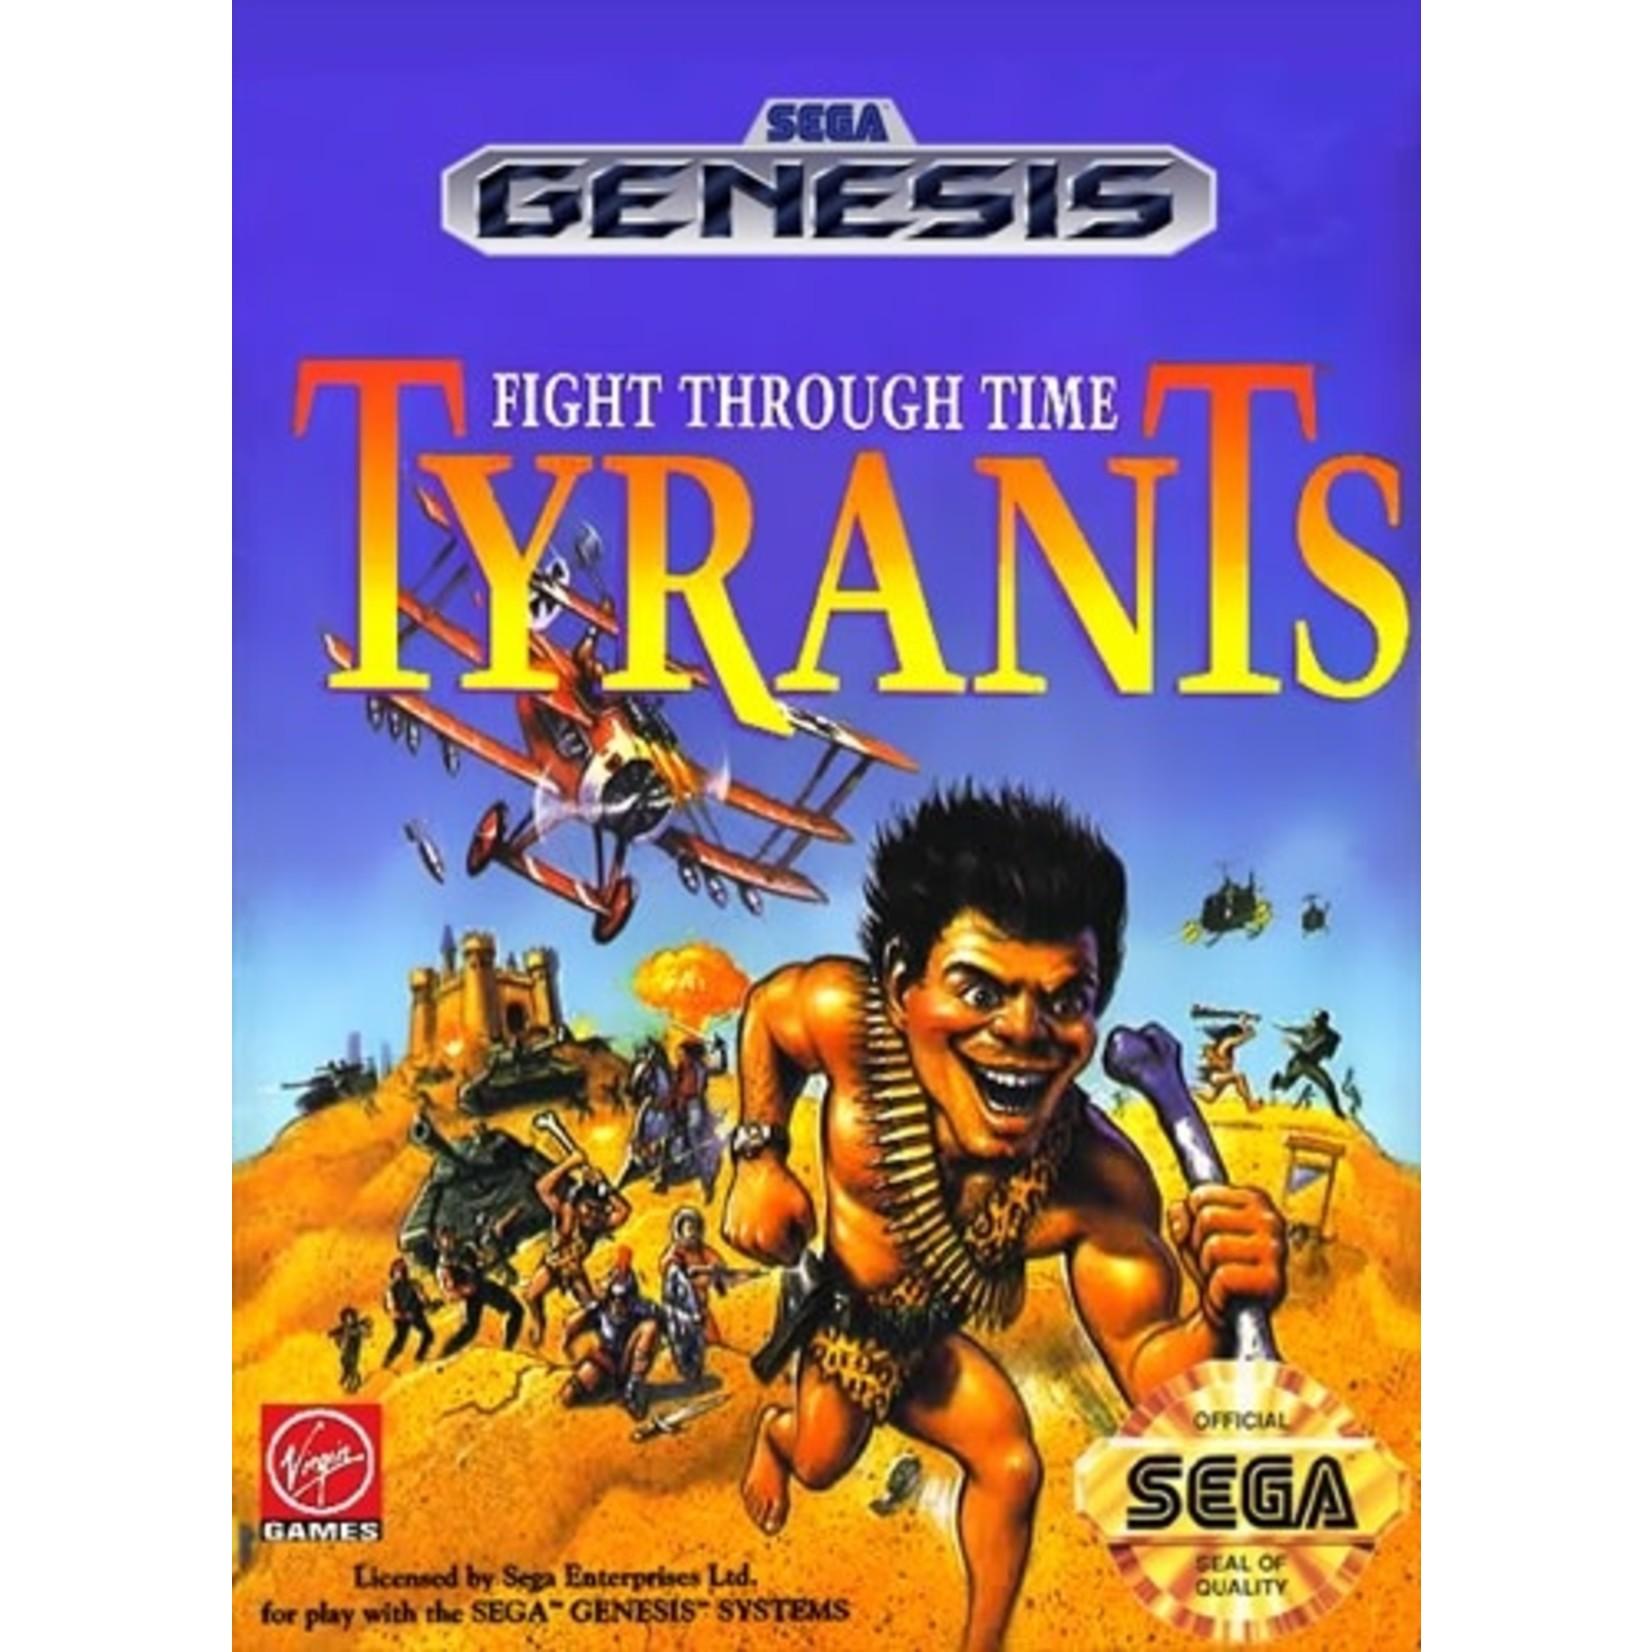 sgu-Tyrants (in box no book)